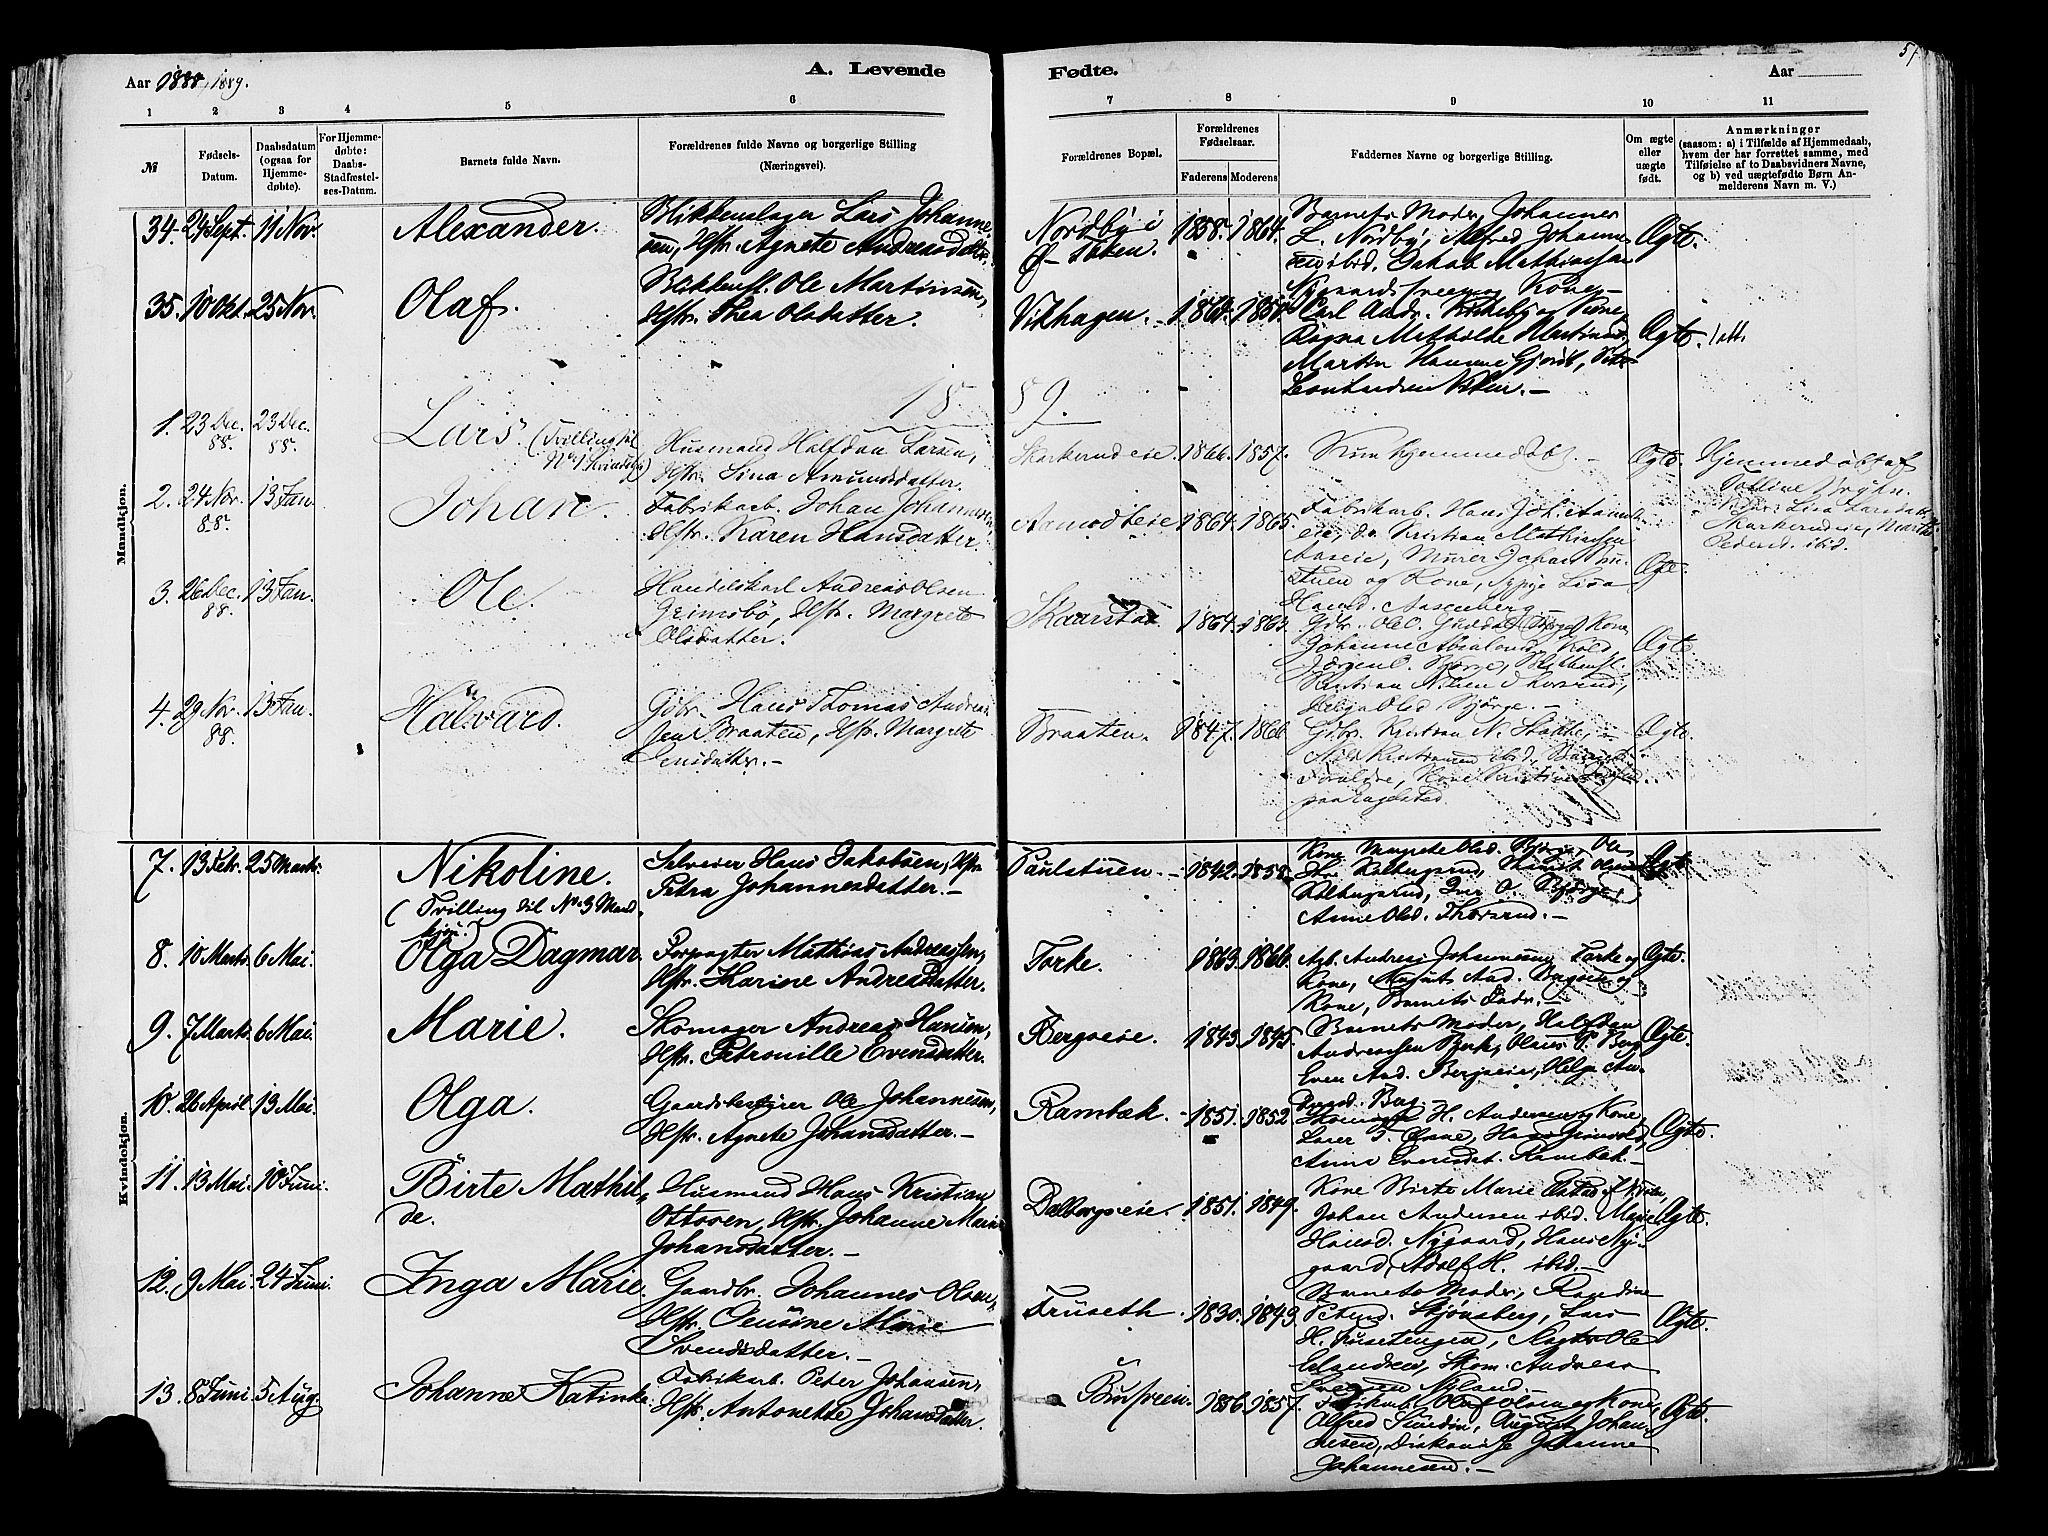 SAH, Vardal prestekontor, H/Ha/Haa/L0009: Ministerialbok nr. 9, 1878-1892, s. 57